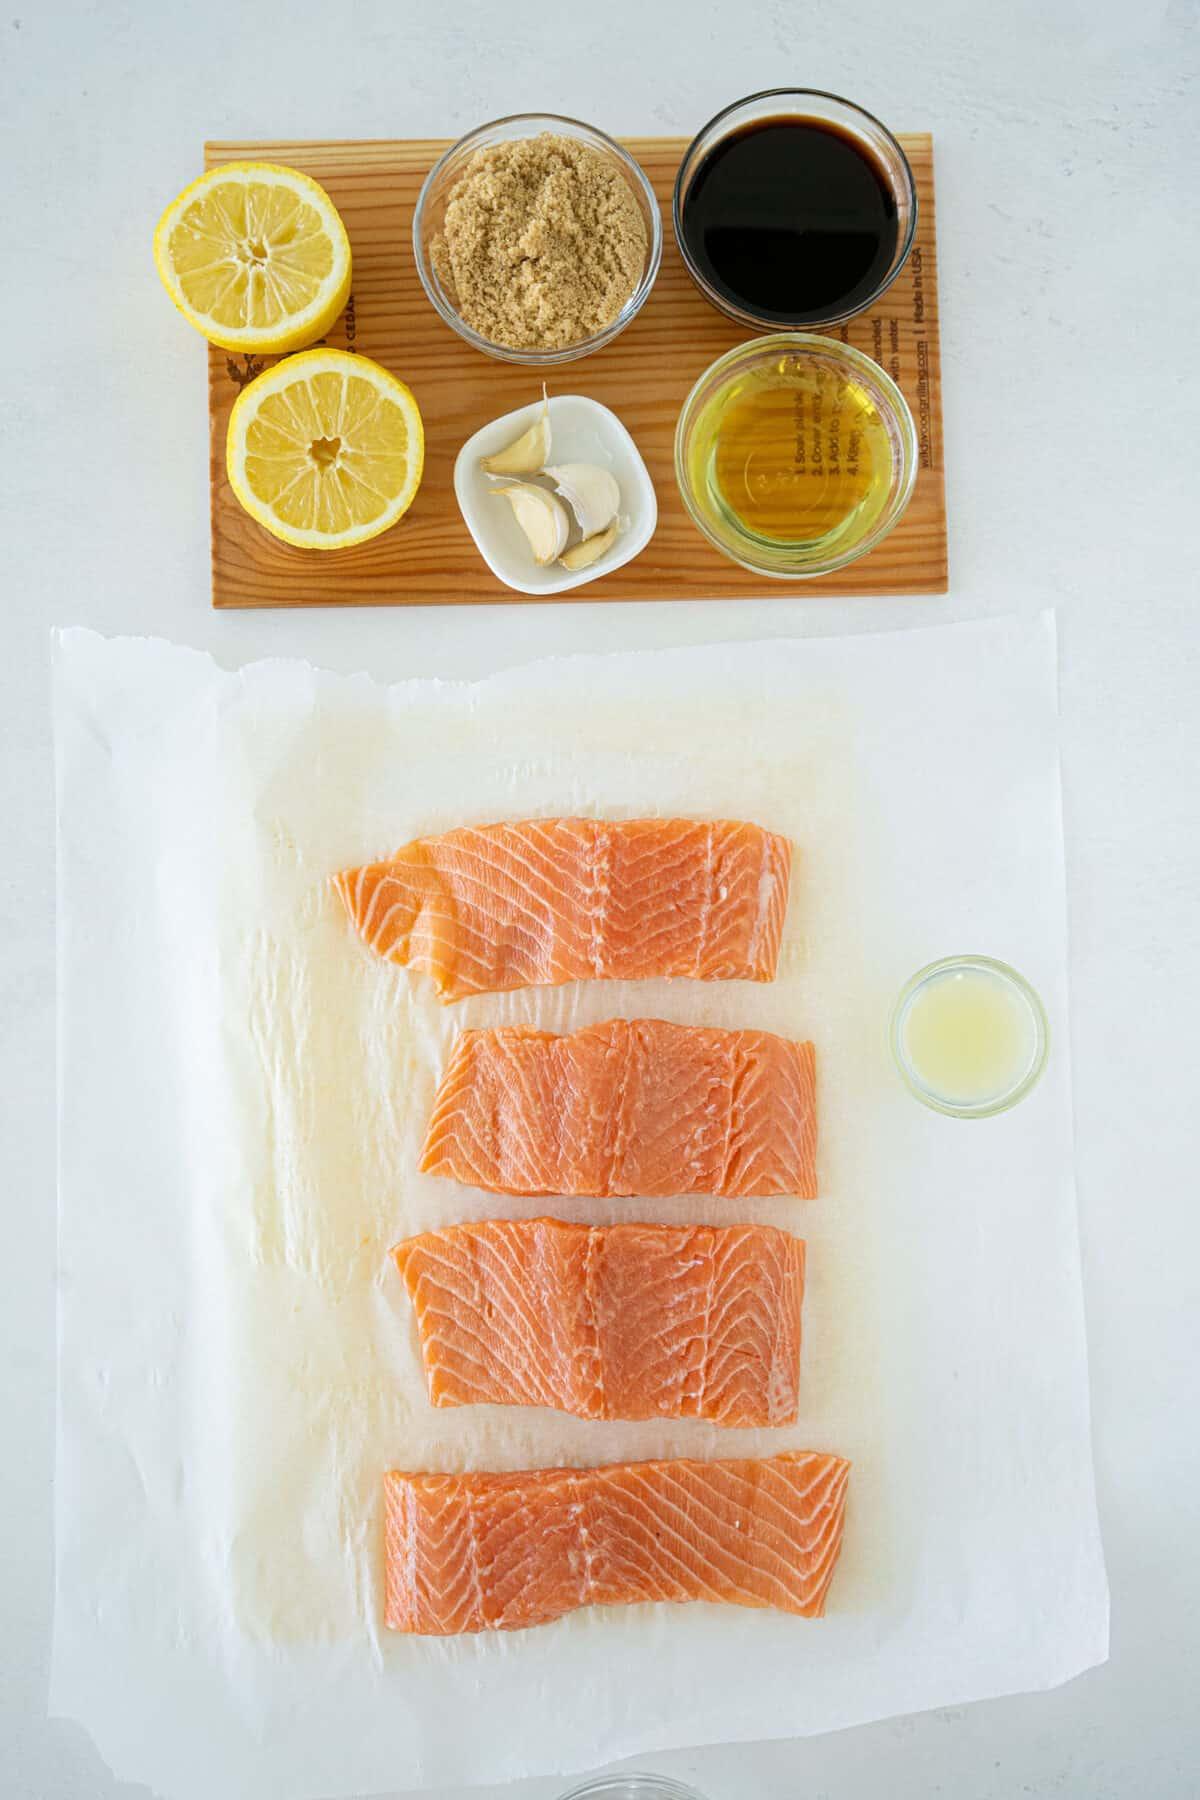 ingredients for cedar plank salmon